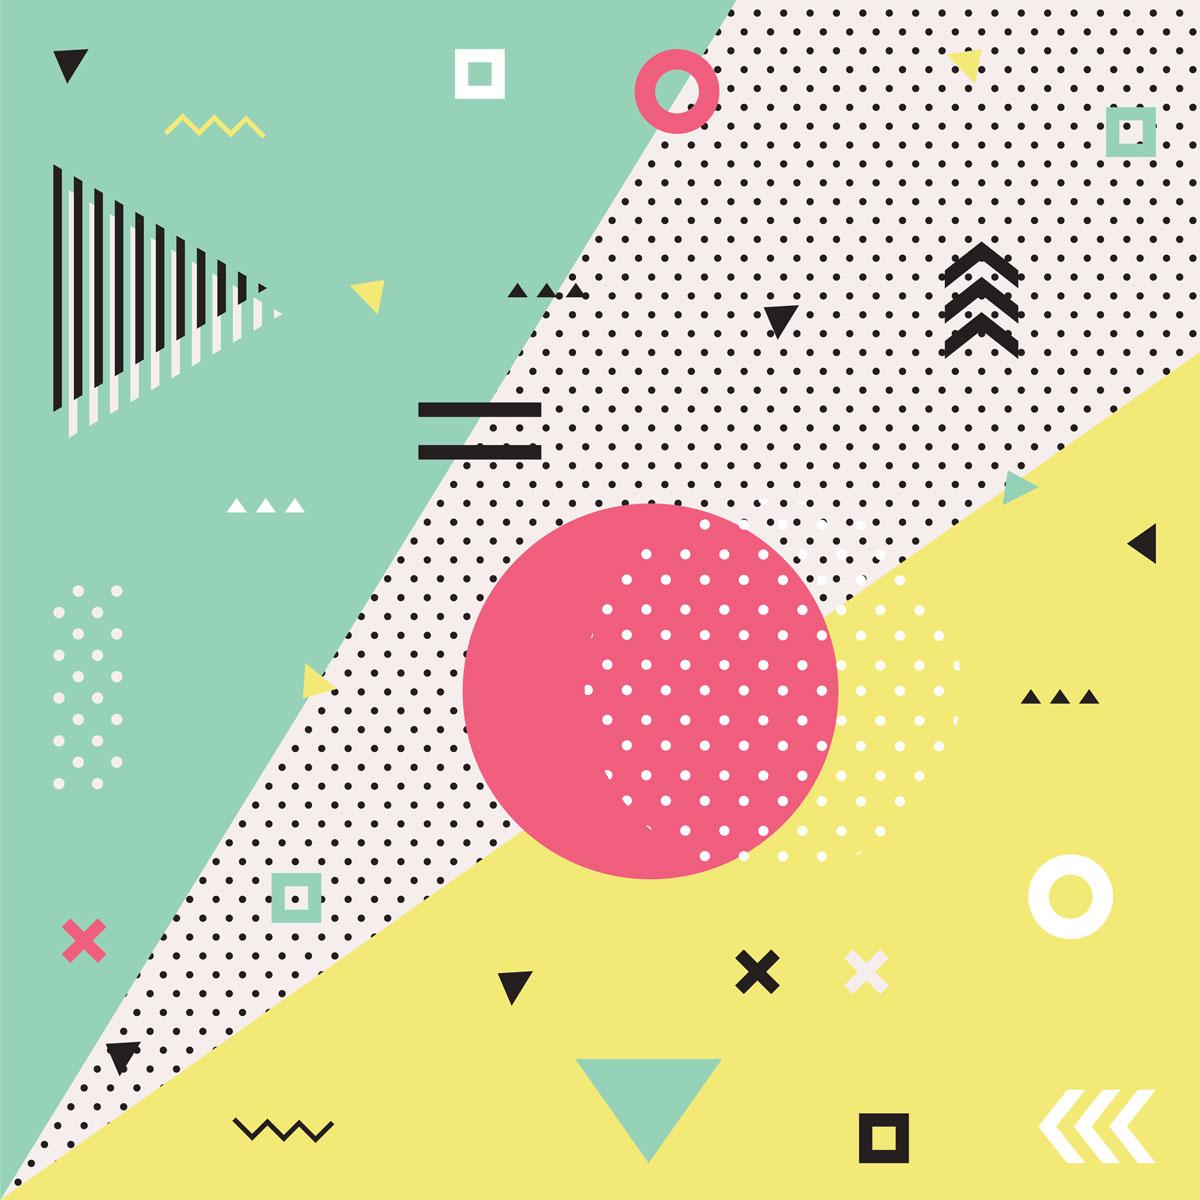 geometric shapes concept